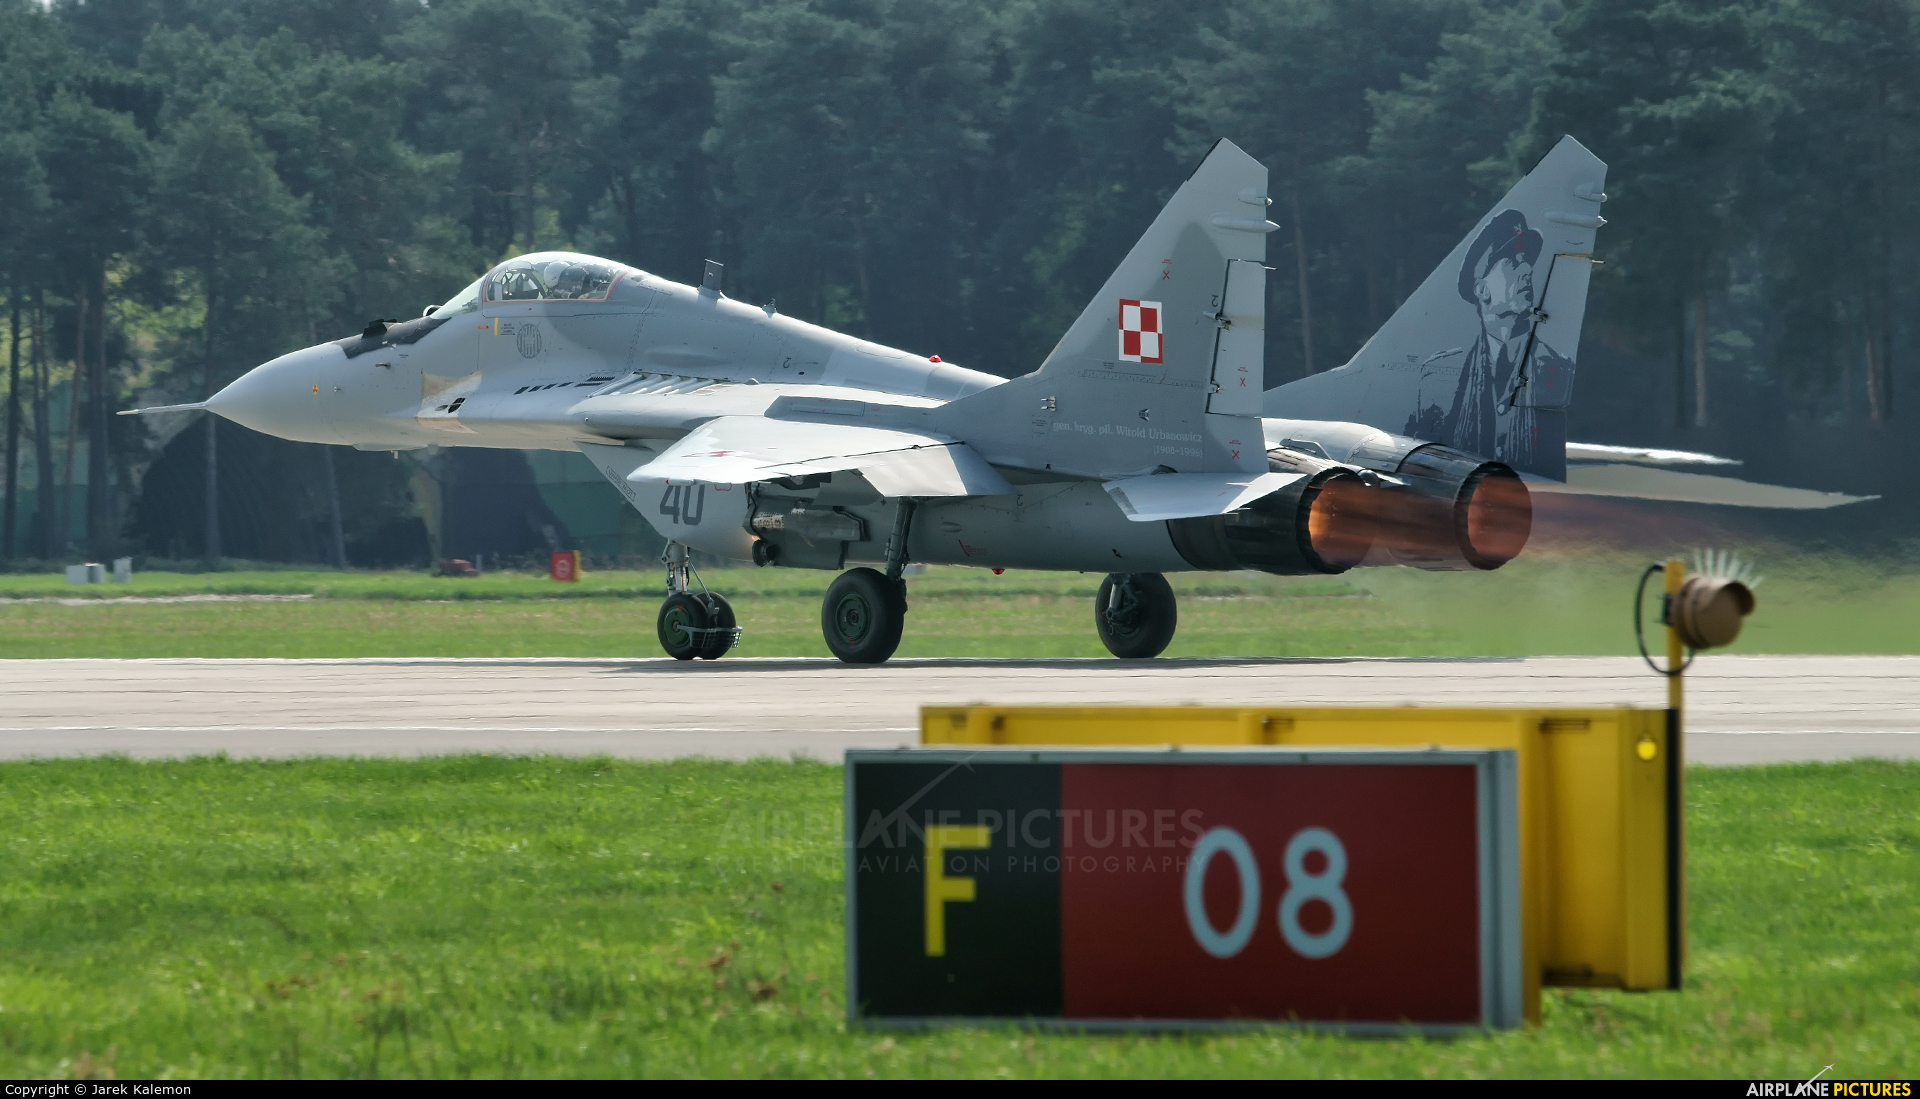 Poland - Air Force 40 aircraft at Bydgoszcz - Szwederowo